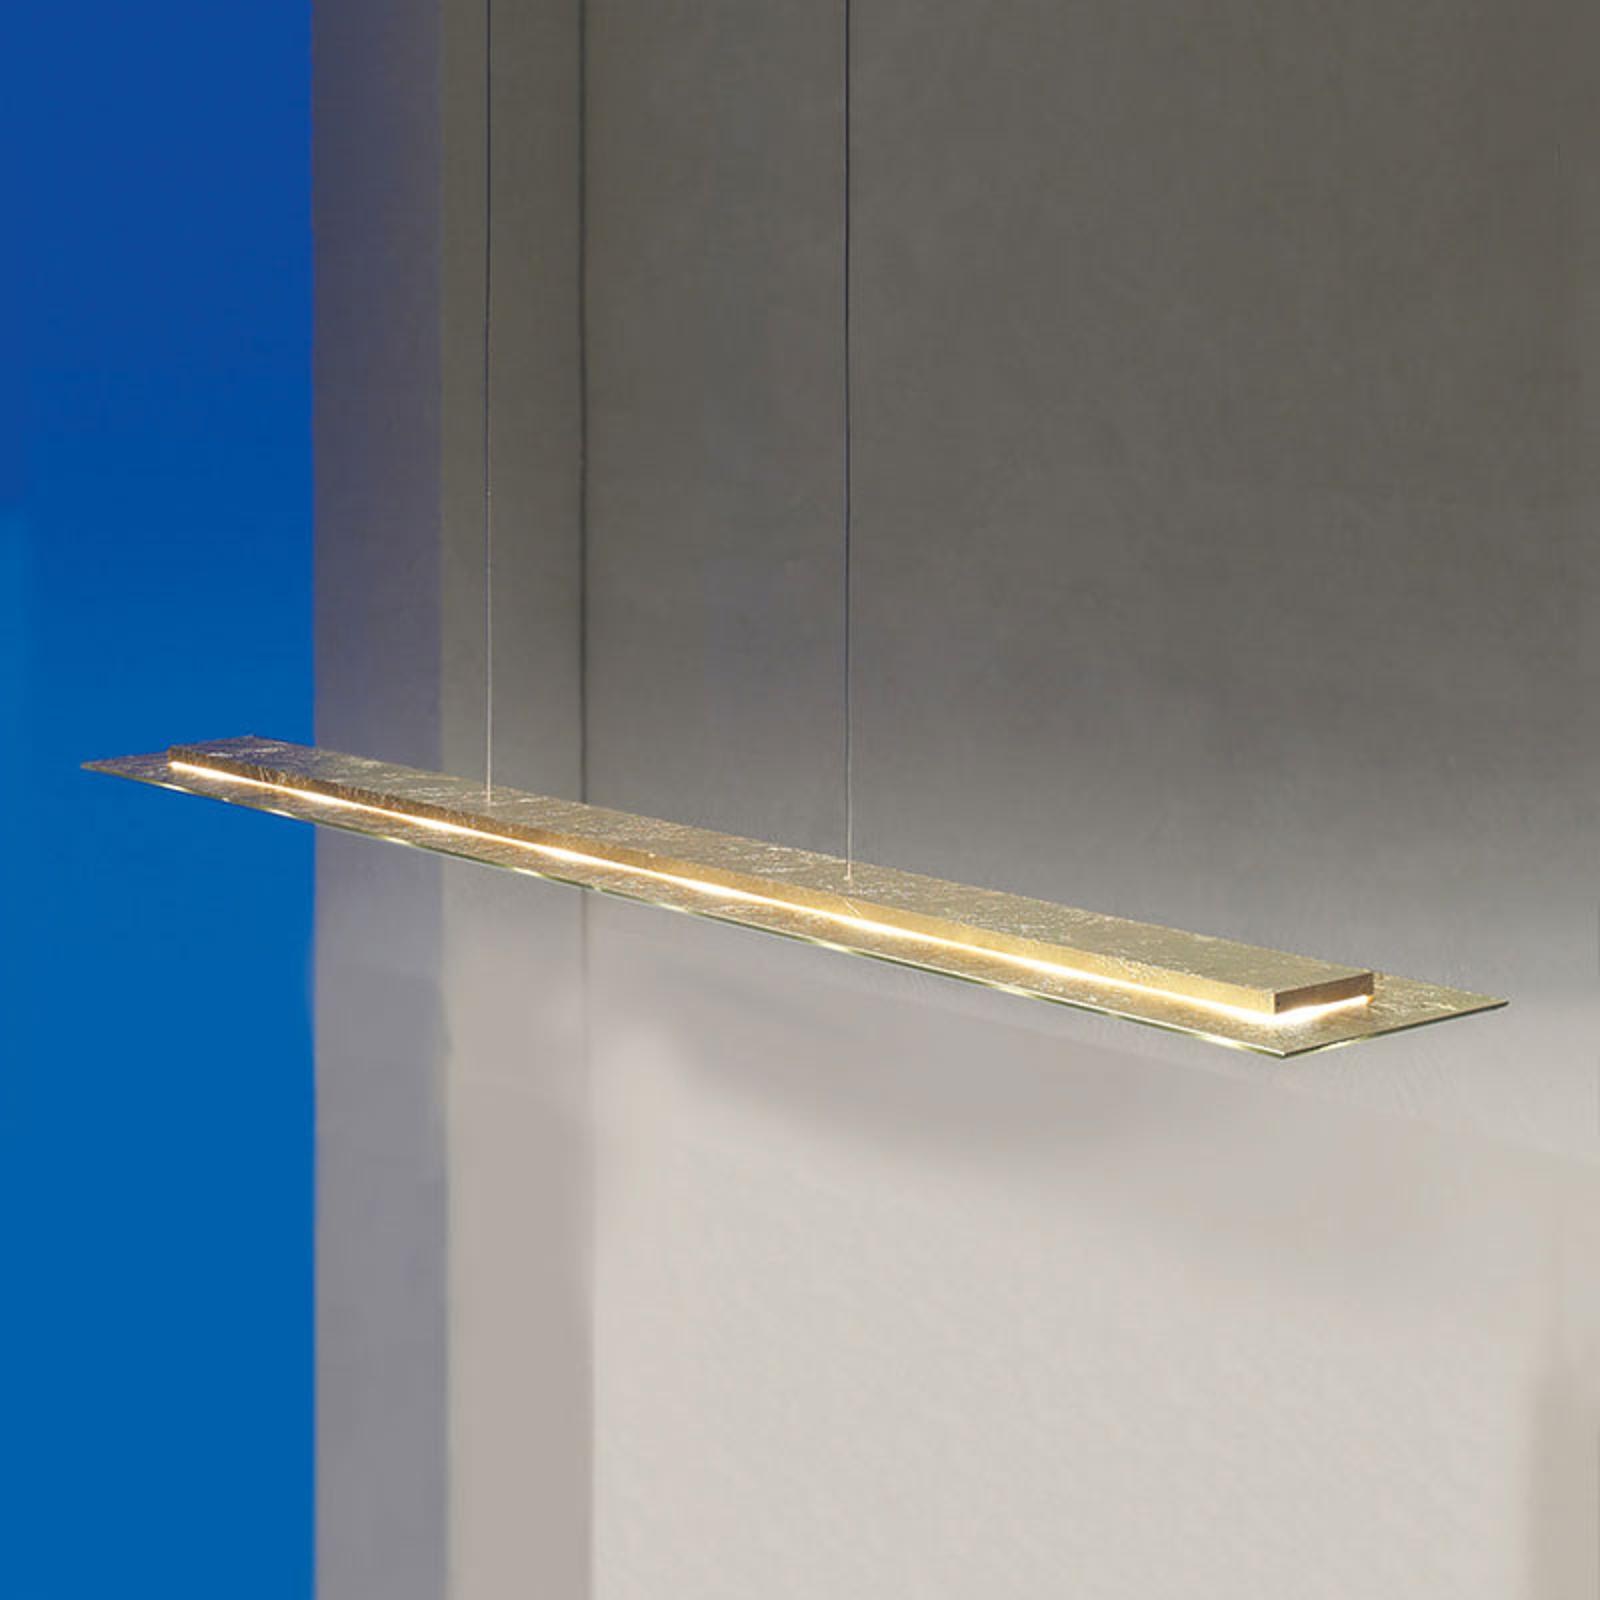 Dimbare led-hanglamp Skyline met bladgoud